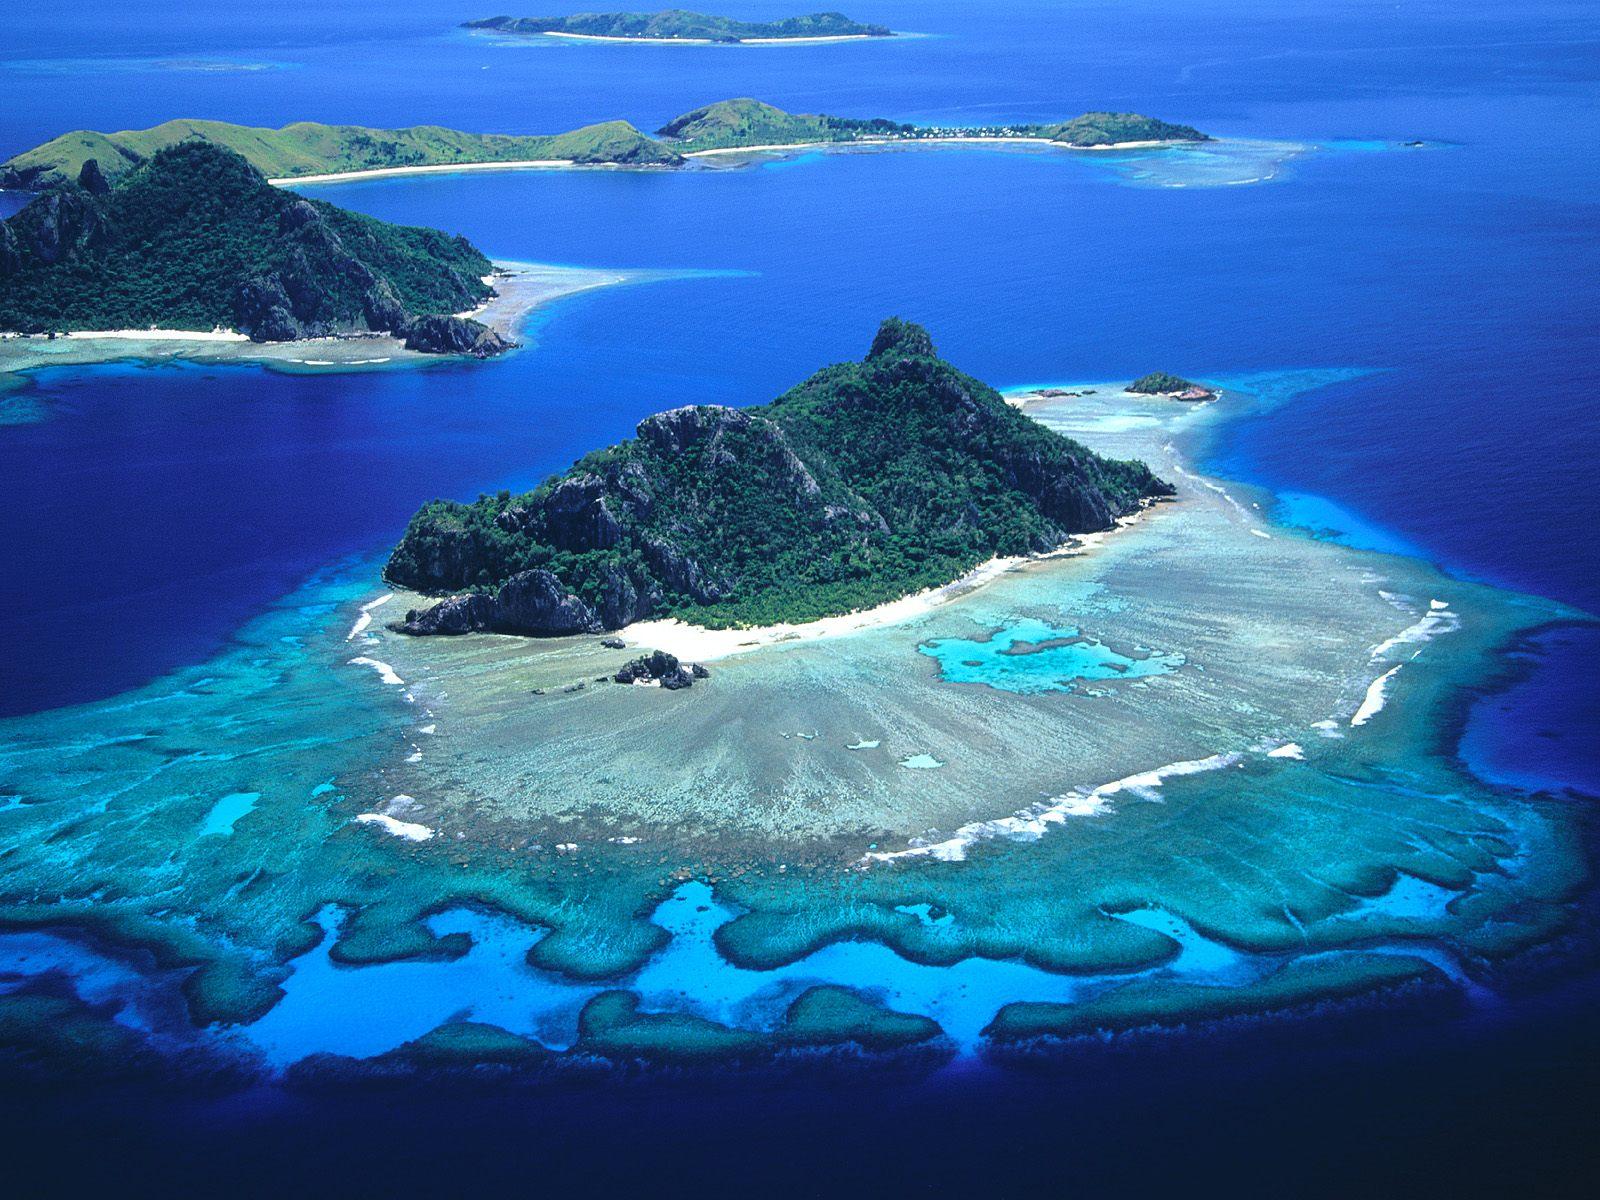 http://3.bp.blogspot.com/-jsLFoBSlP_c/UaRO5ONbv3I/AAAAAAAAOnU/kIP8PwqPLAM/s1600/Fiji+%25281%2529.jpg